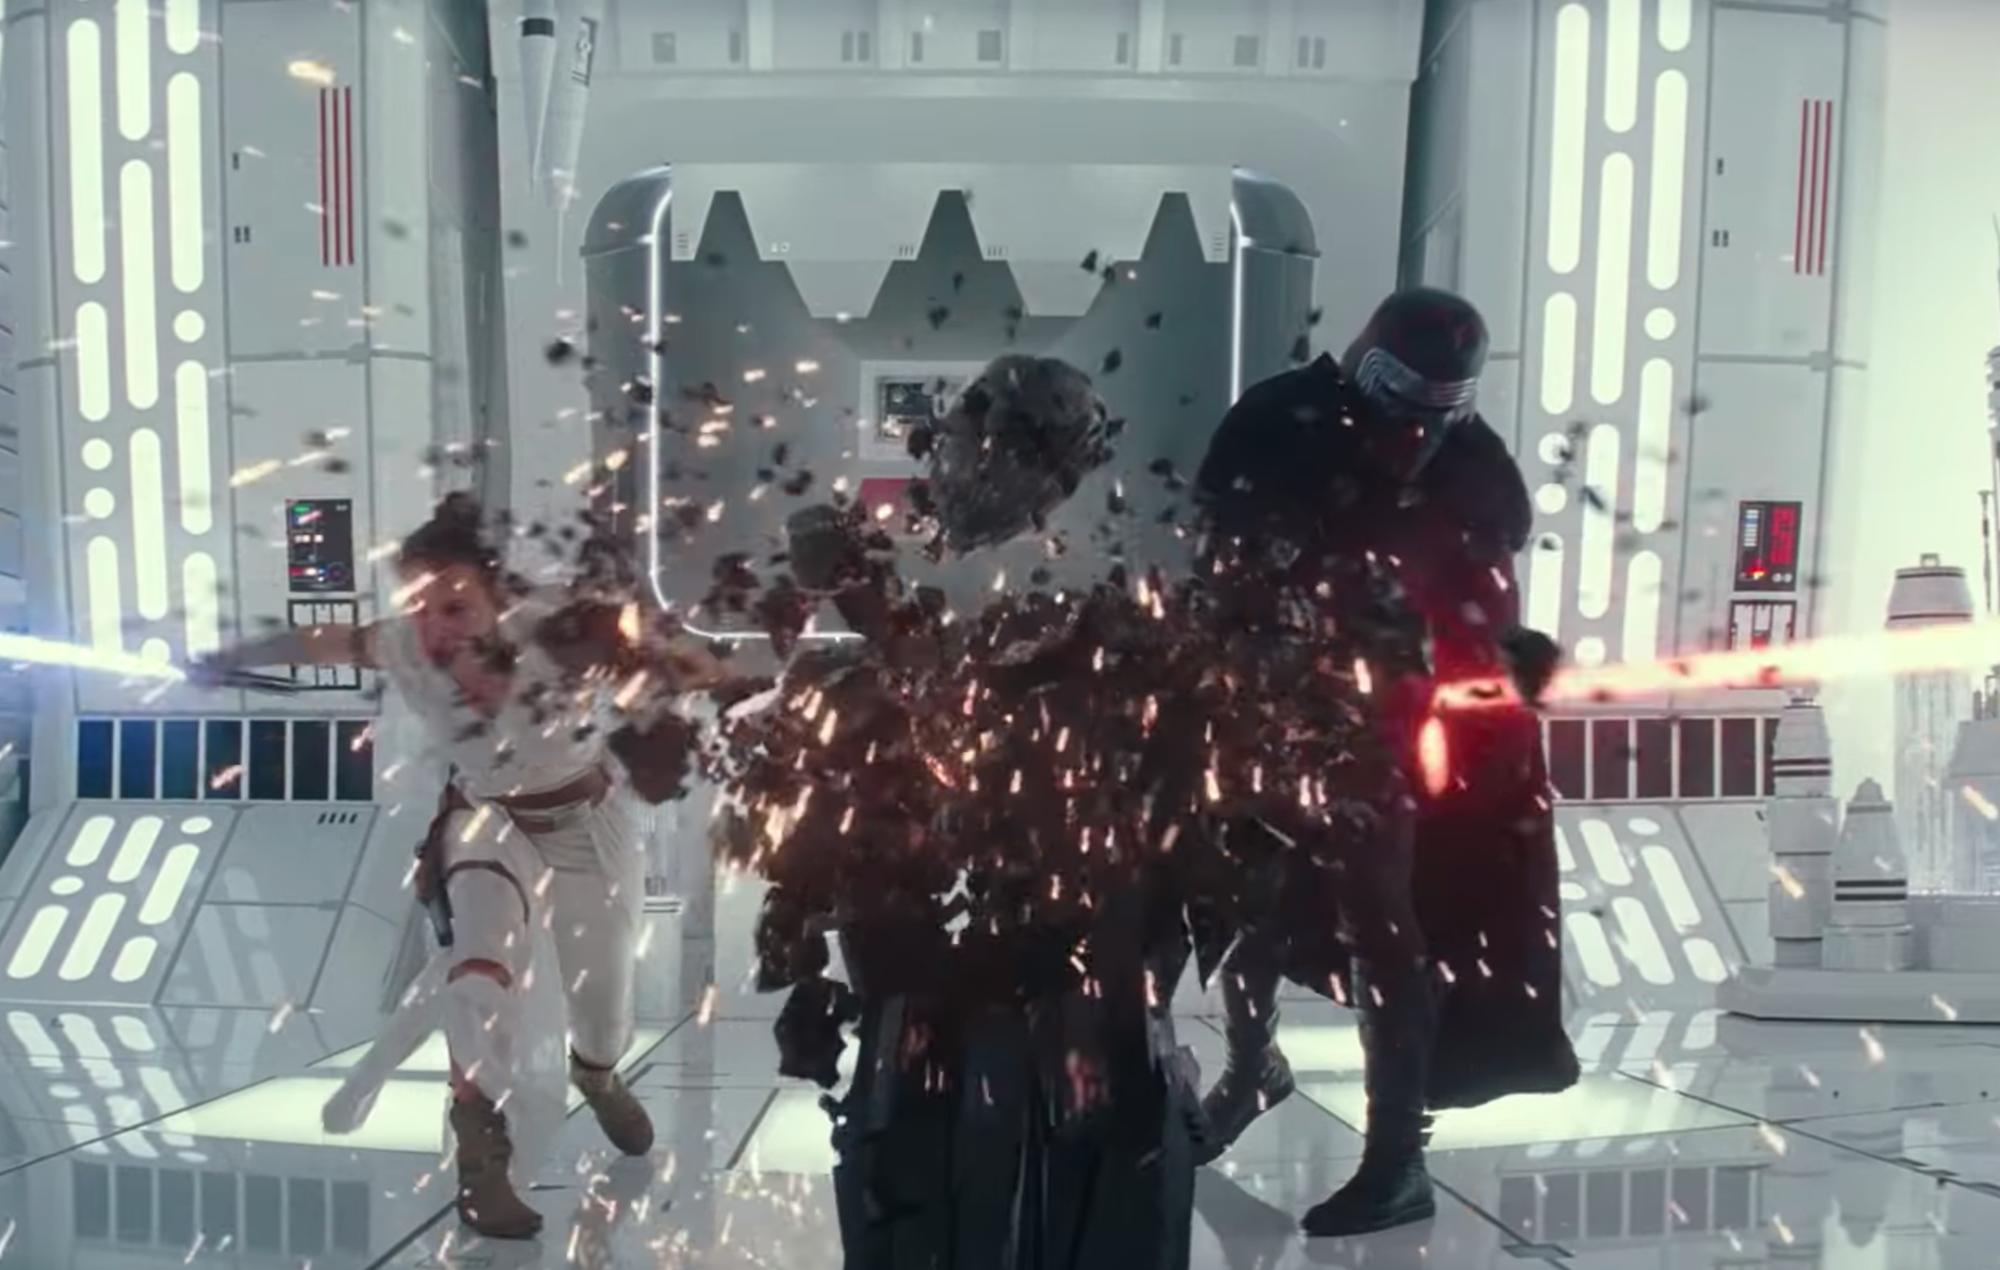 The Rise of Skywalker trailer